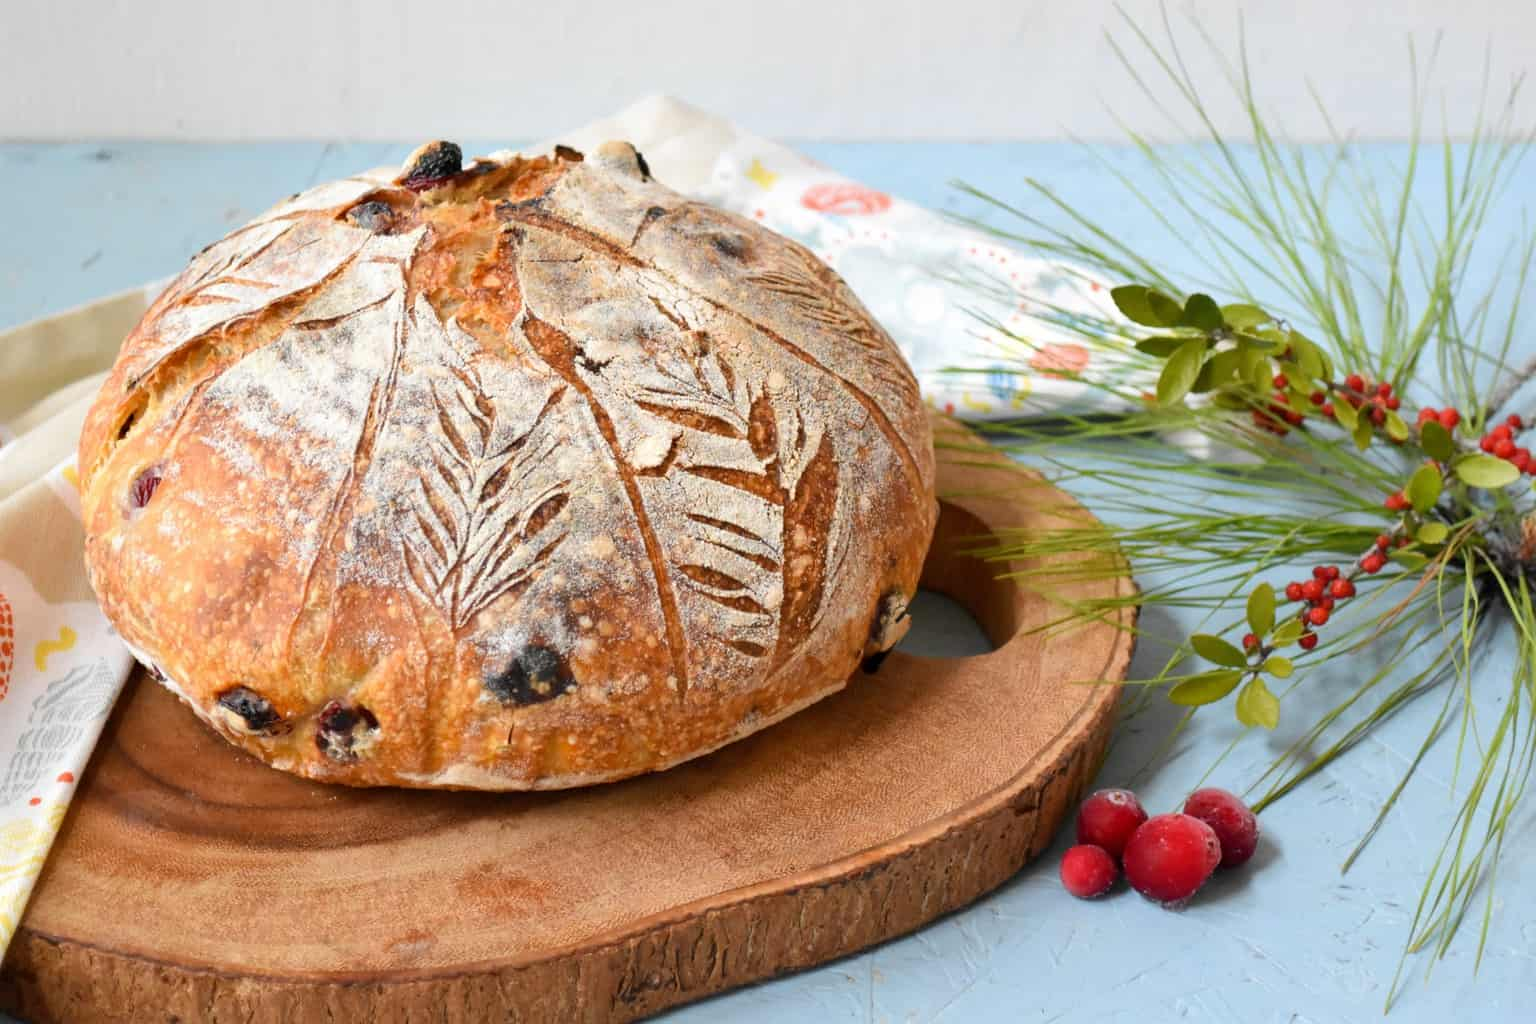 "<img src=""https://cdn.shortpixel.ai/client/q_glossy,ret_img,w_4096,h_2730/Cranberry Pecan Sourdough Bread .jpg"" alt="" whole loaf of Cranberry Pecan Sourdough Bread "">"